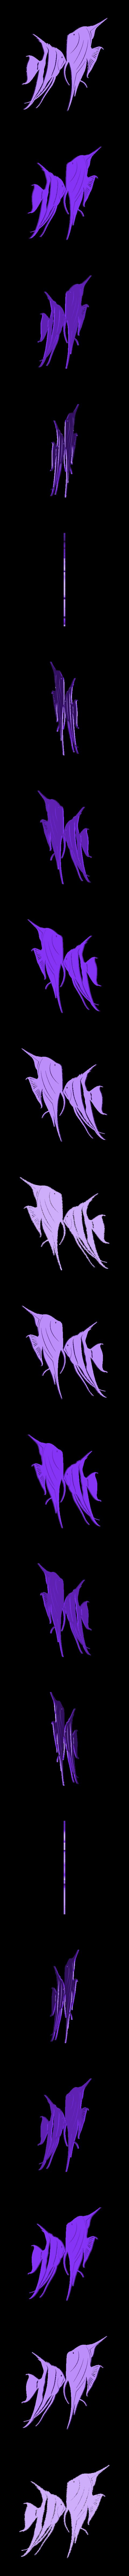 1_Angel_Pair.stl Download STL file Angel fish wall art \ Decor • 3D printing object, 3dprintlines